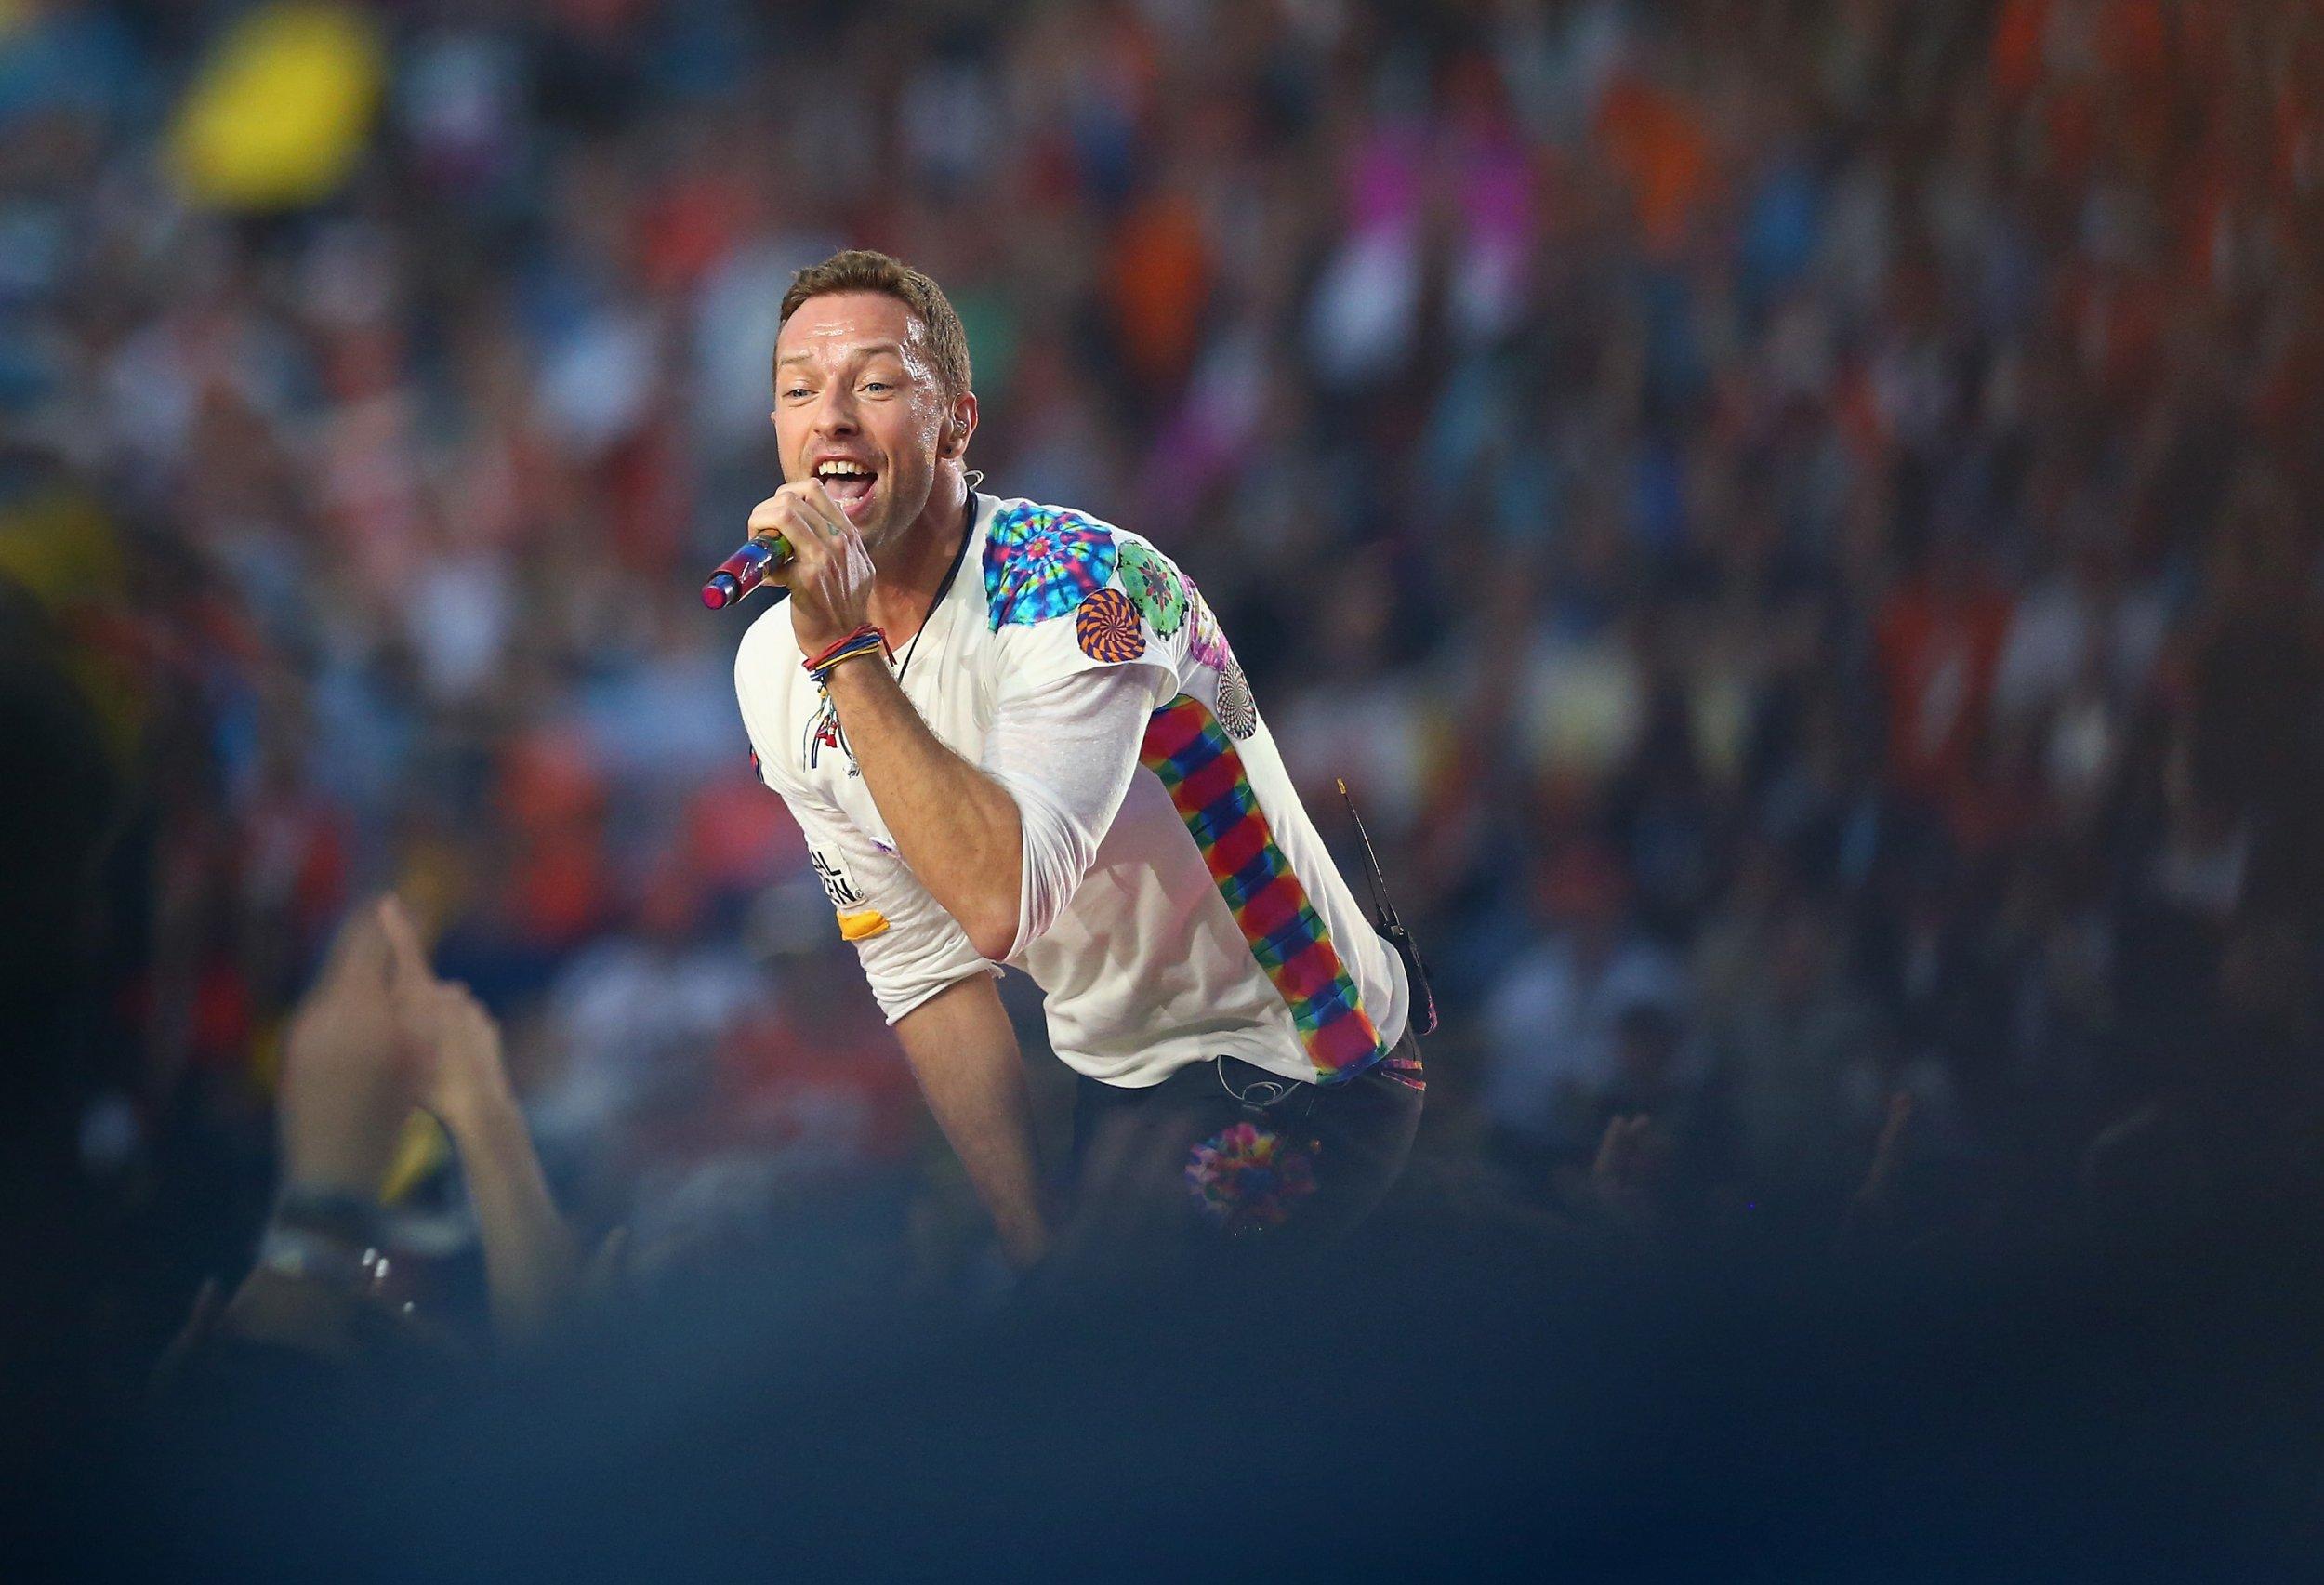 Coldplay perform at Super Bowl 50